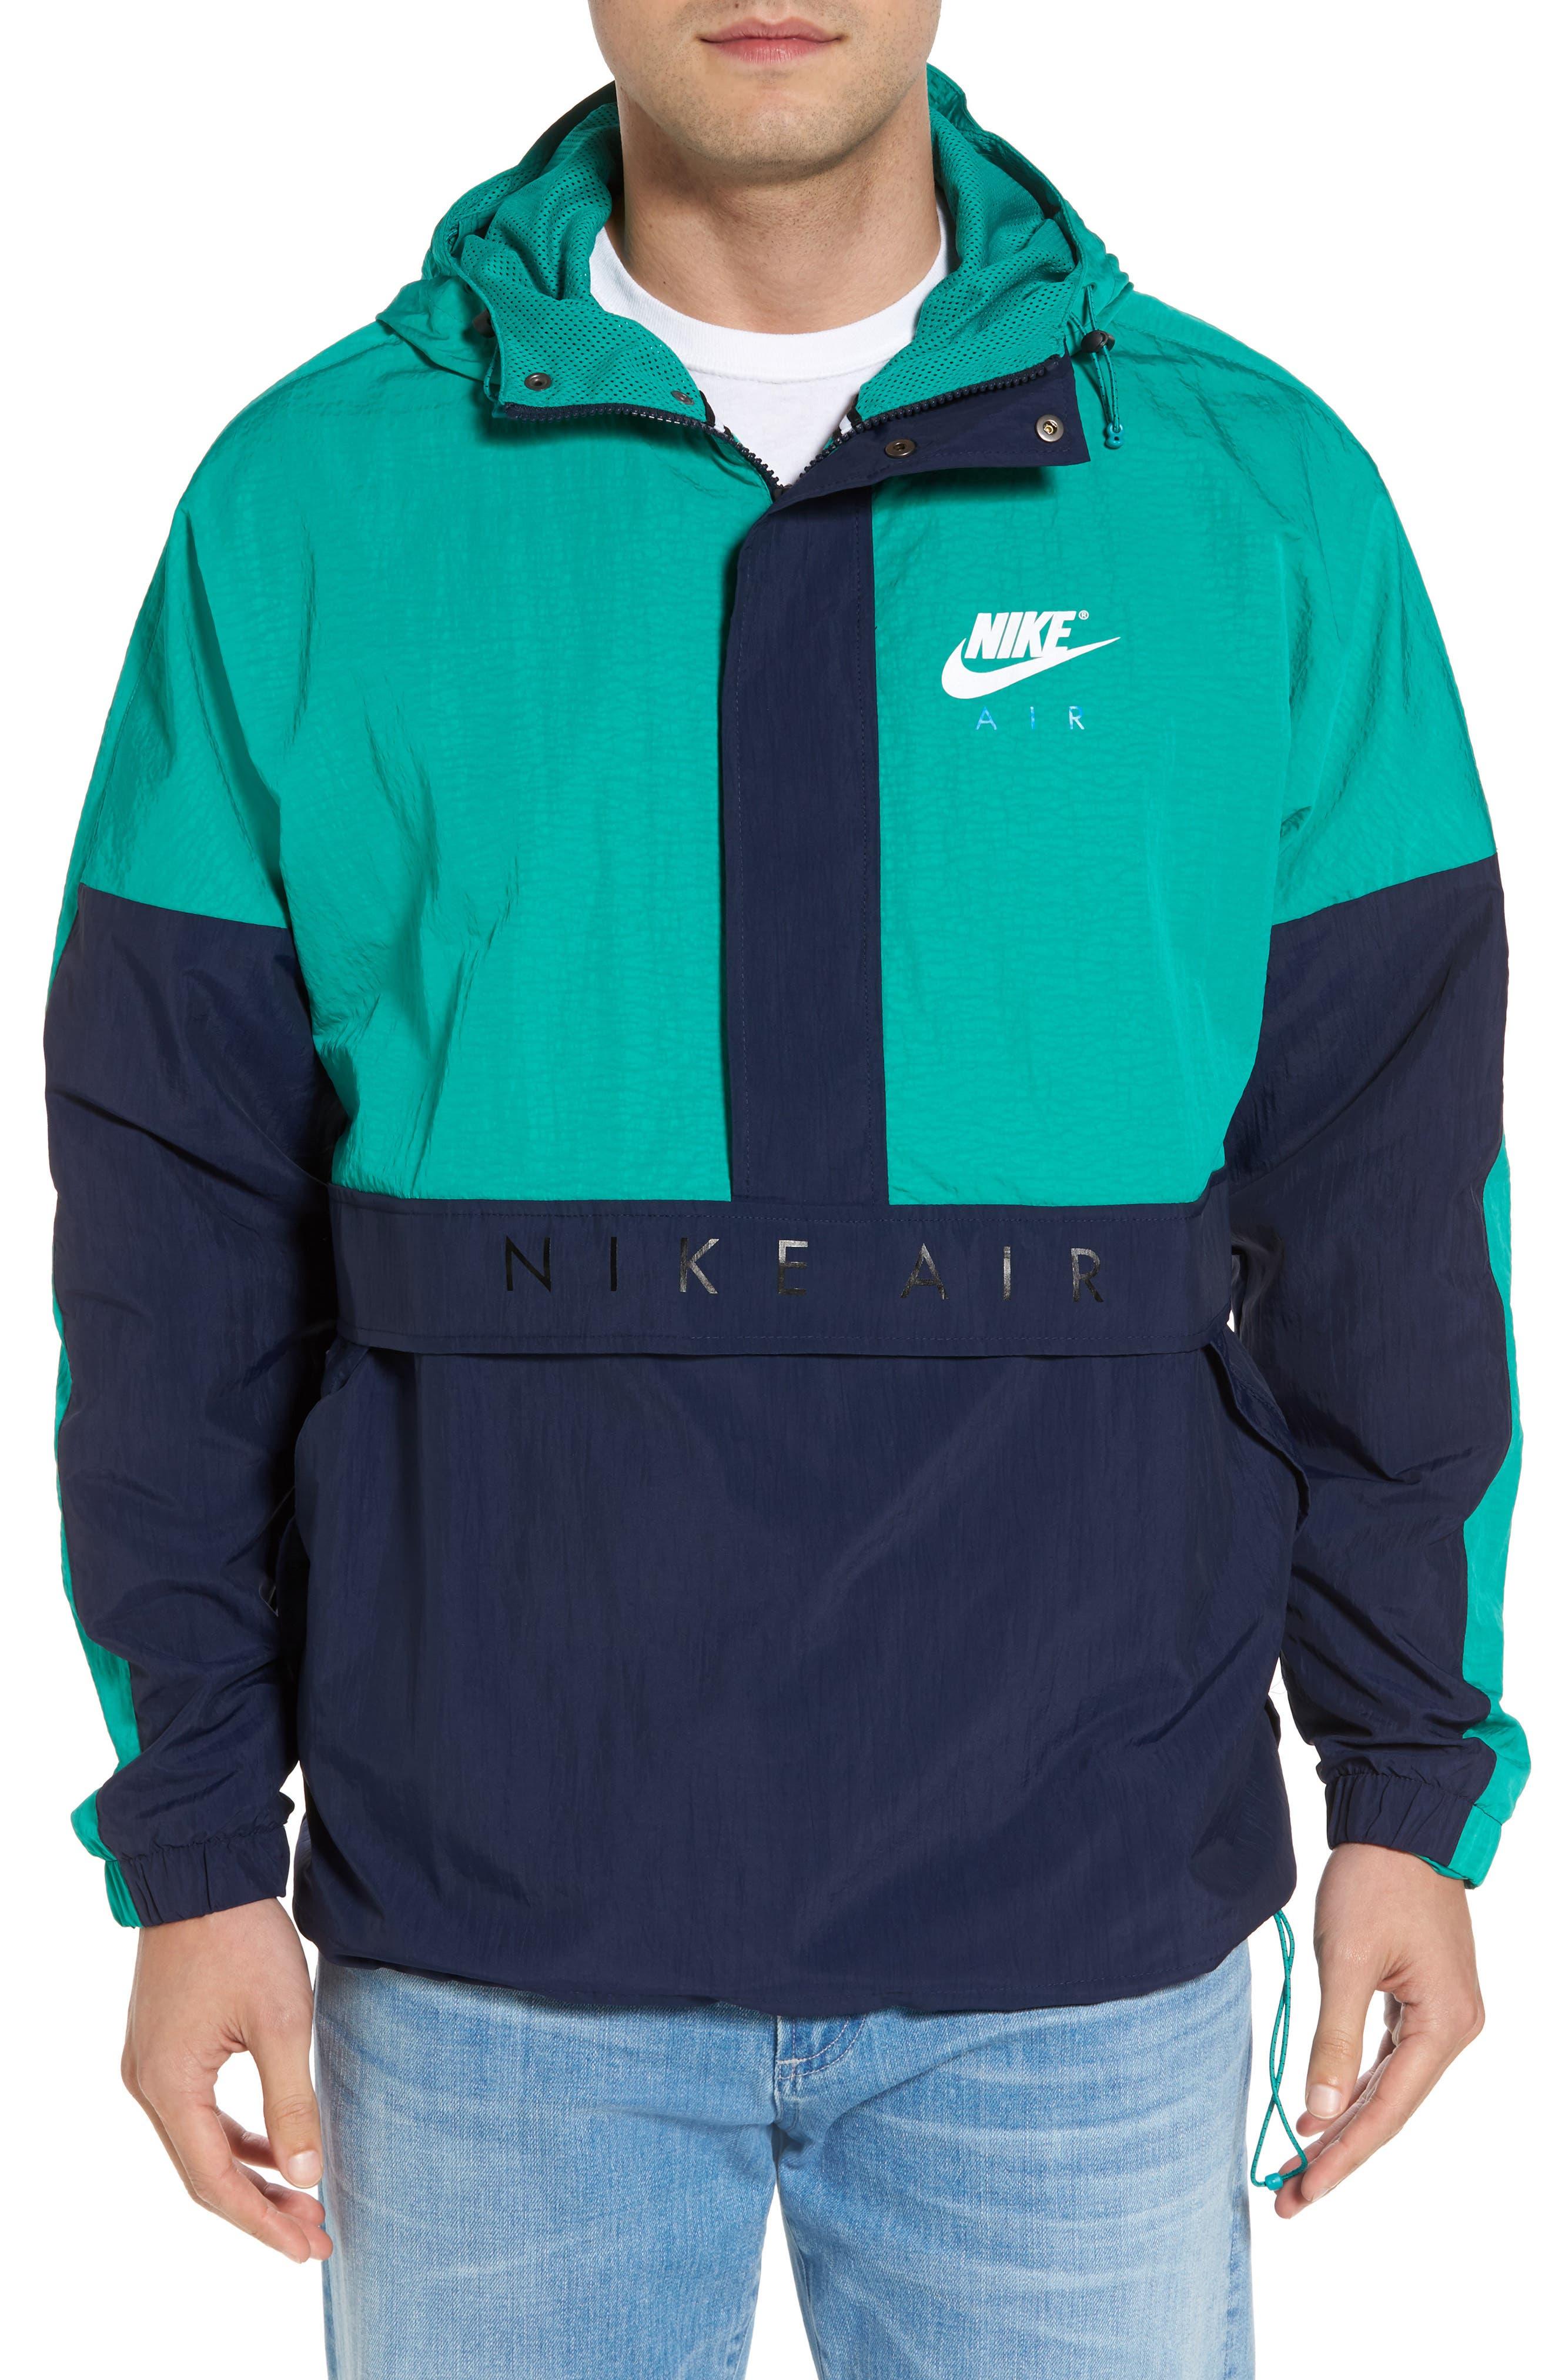 Nike Sportswear Air Hooded Jacket